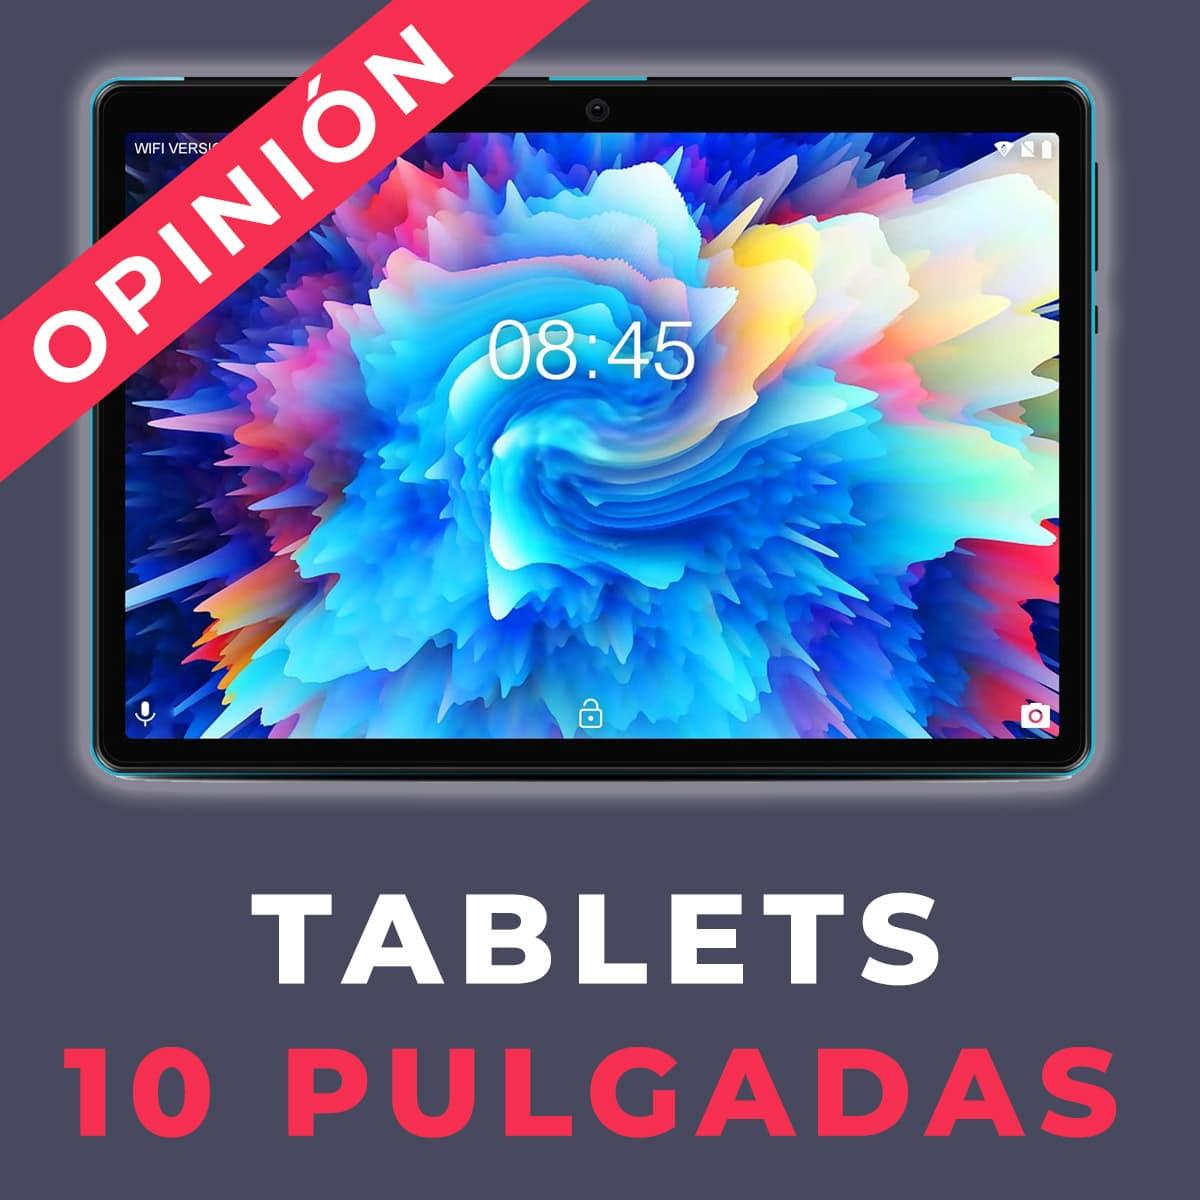 tablets 10 pulgadas